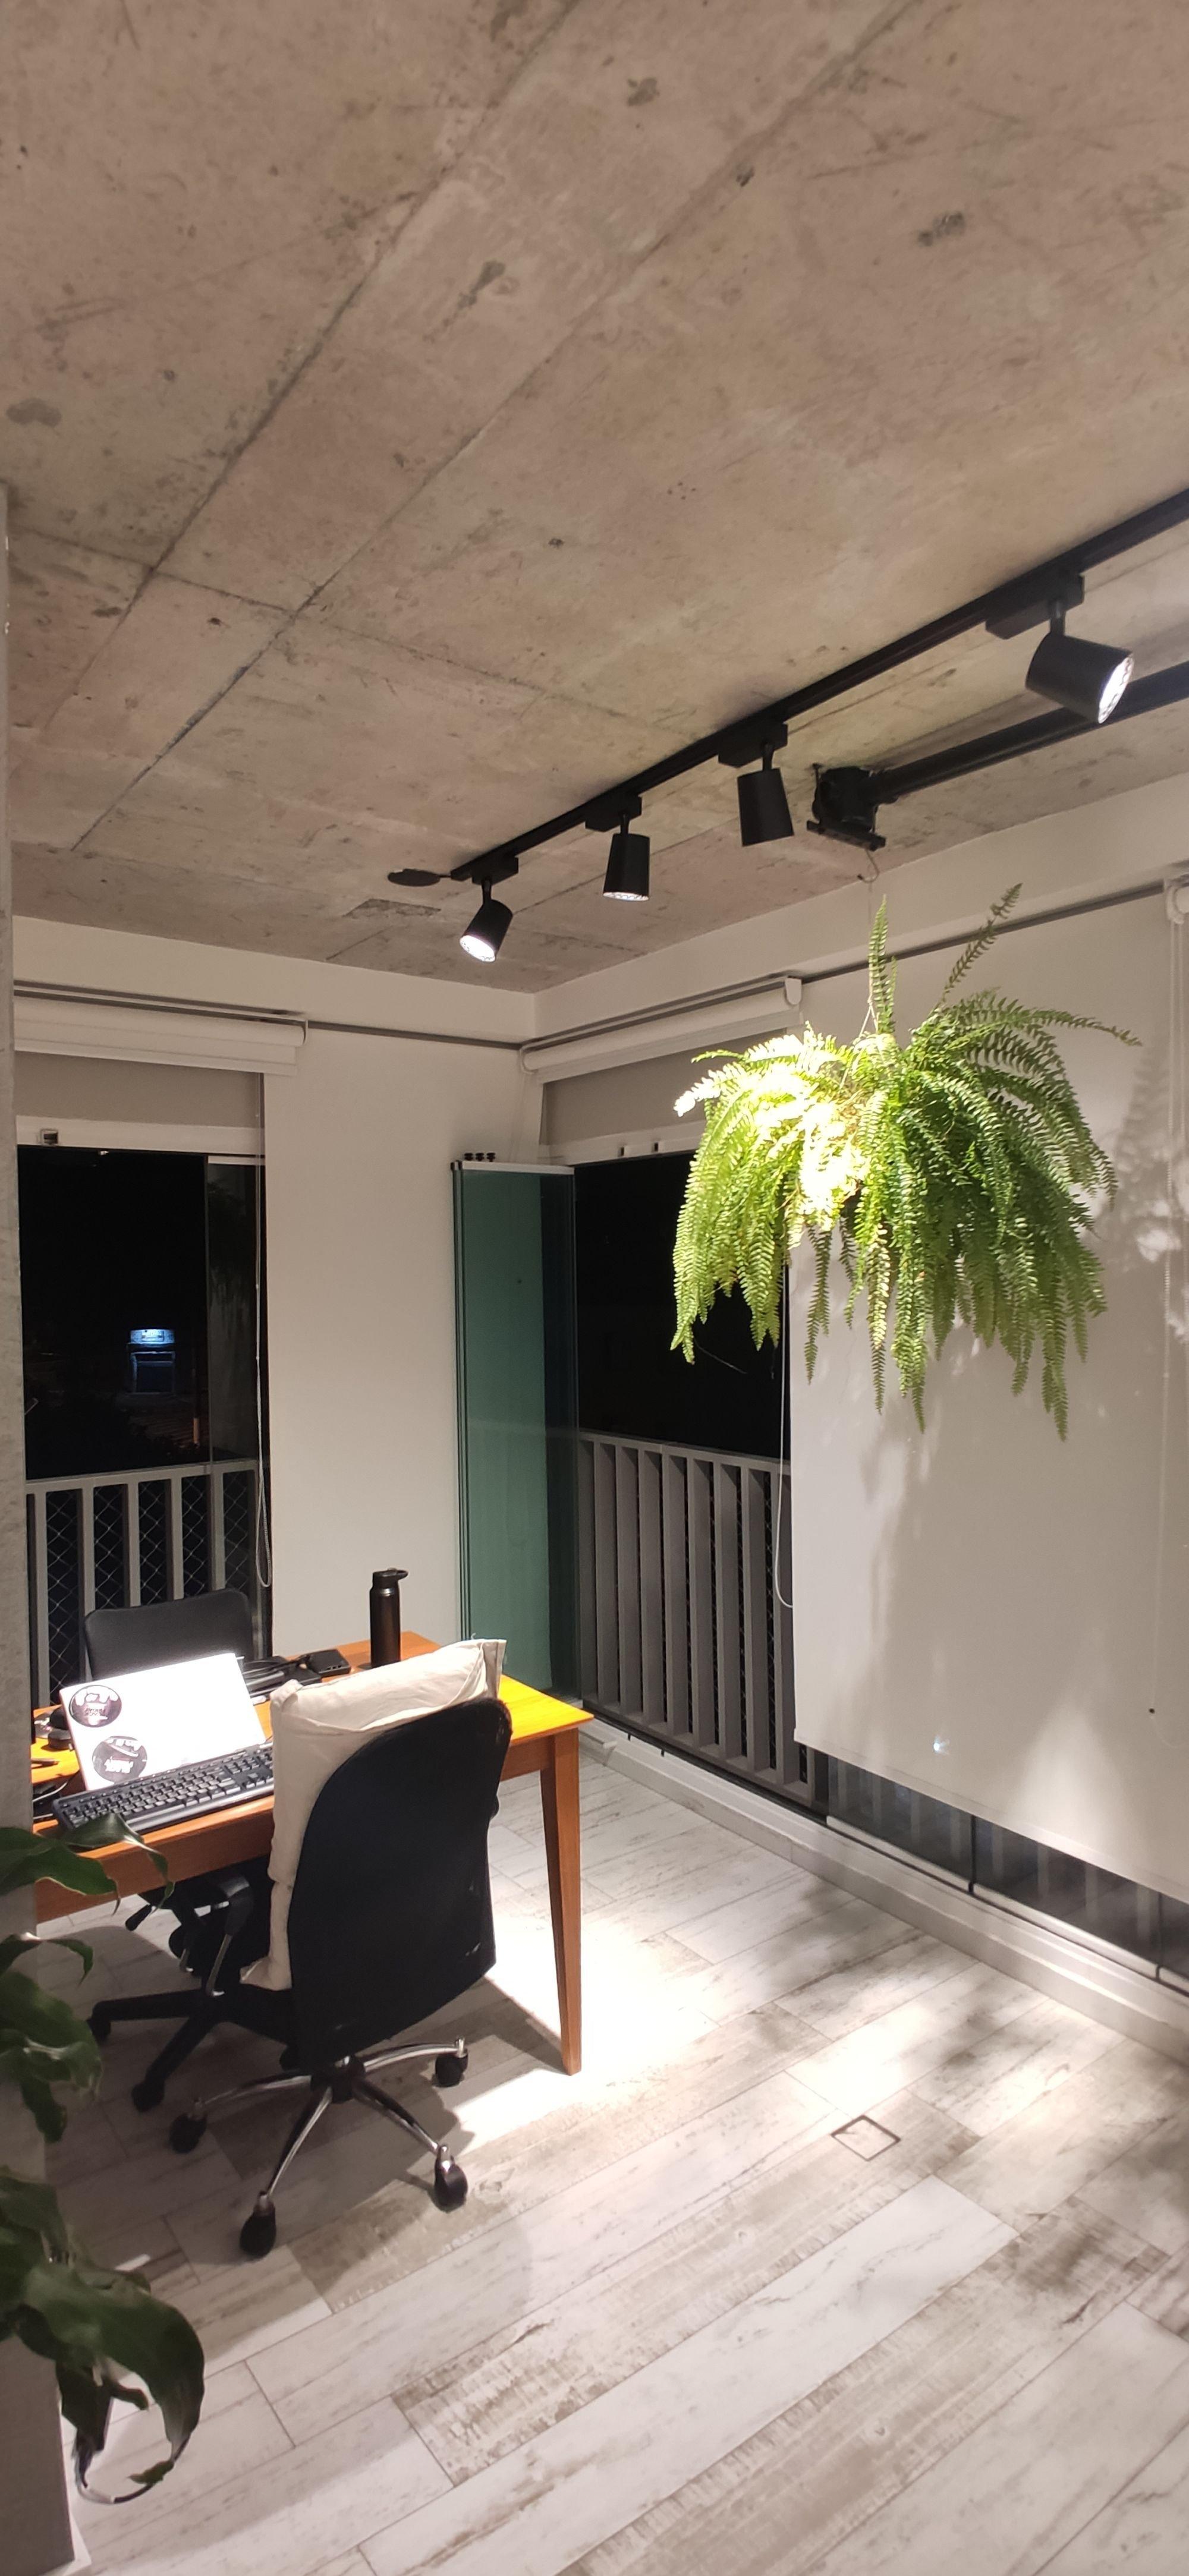 Nesta foto há vaso de planta, cadeira